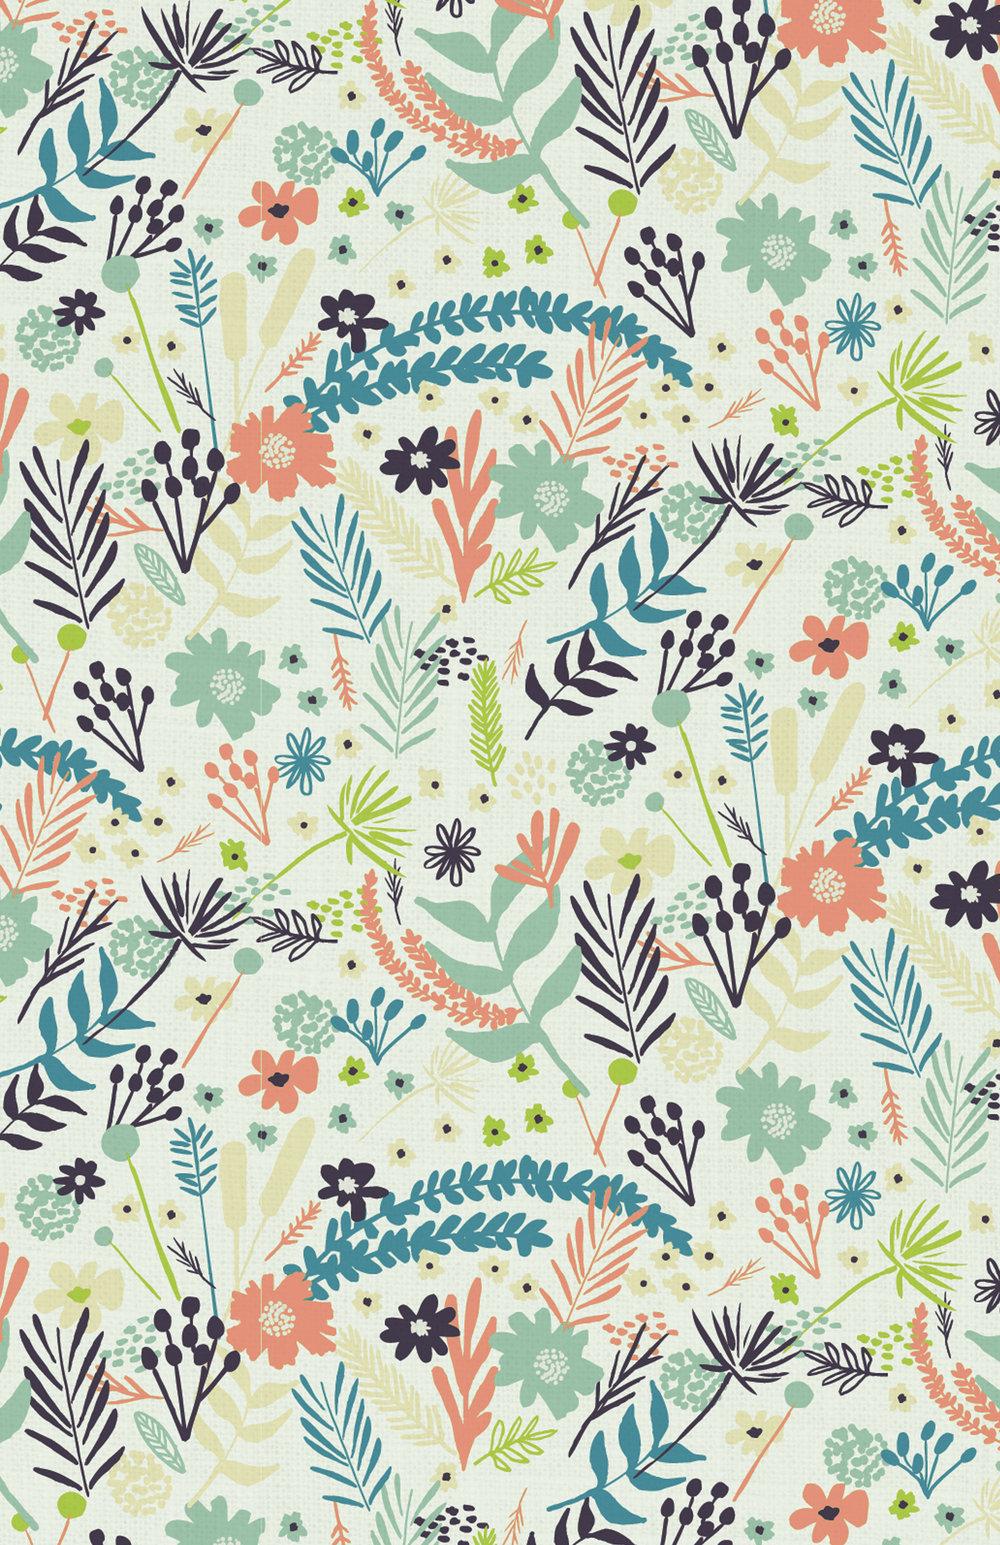 pattern42-01.jpg